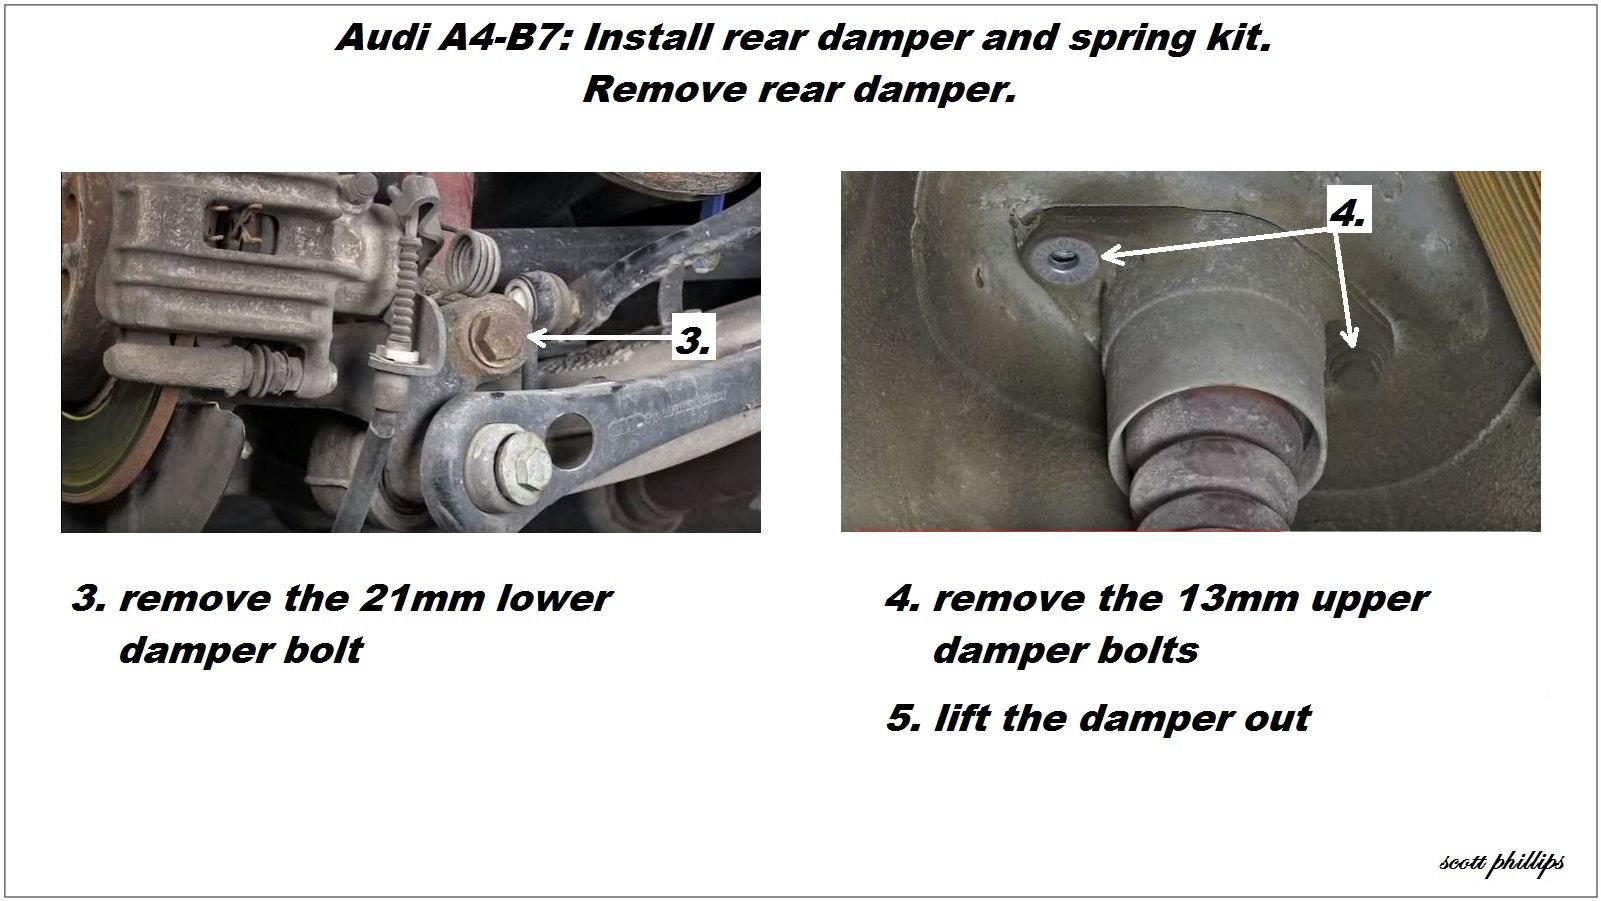 audi a4 b7 shock reviews and how to install shock absorber audiworld rh audiworld com 2000 Audi A4 1999 Audi A4 Quattro